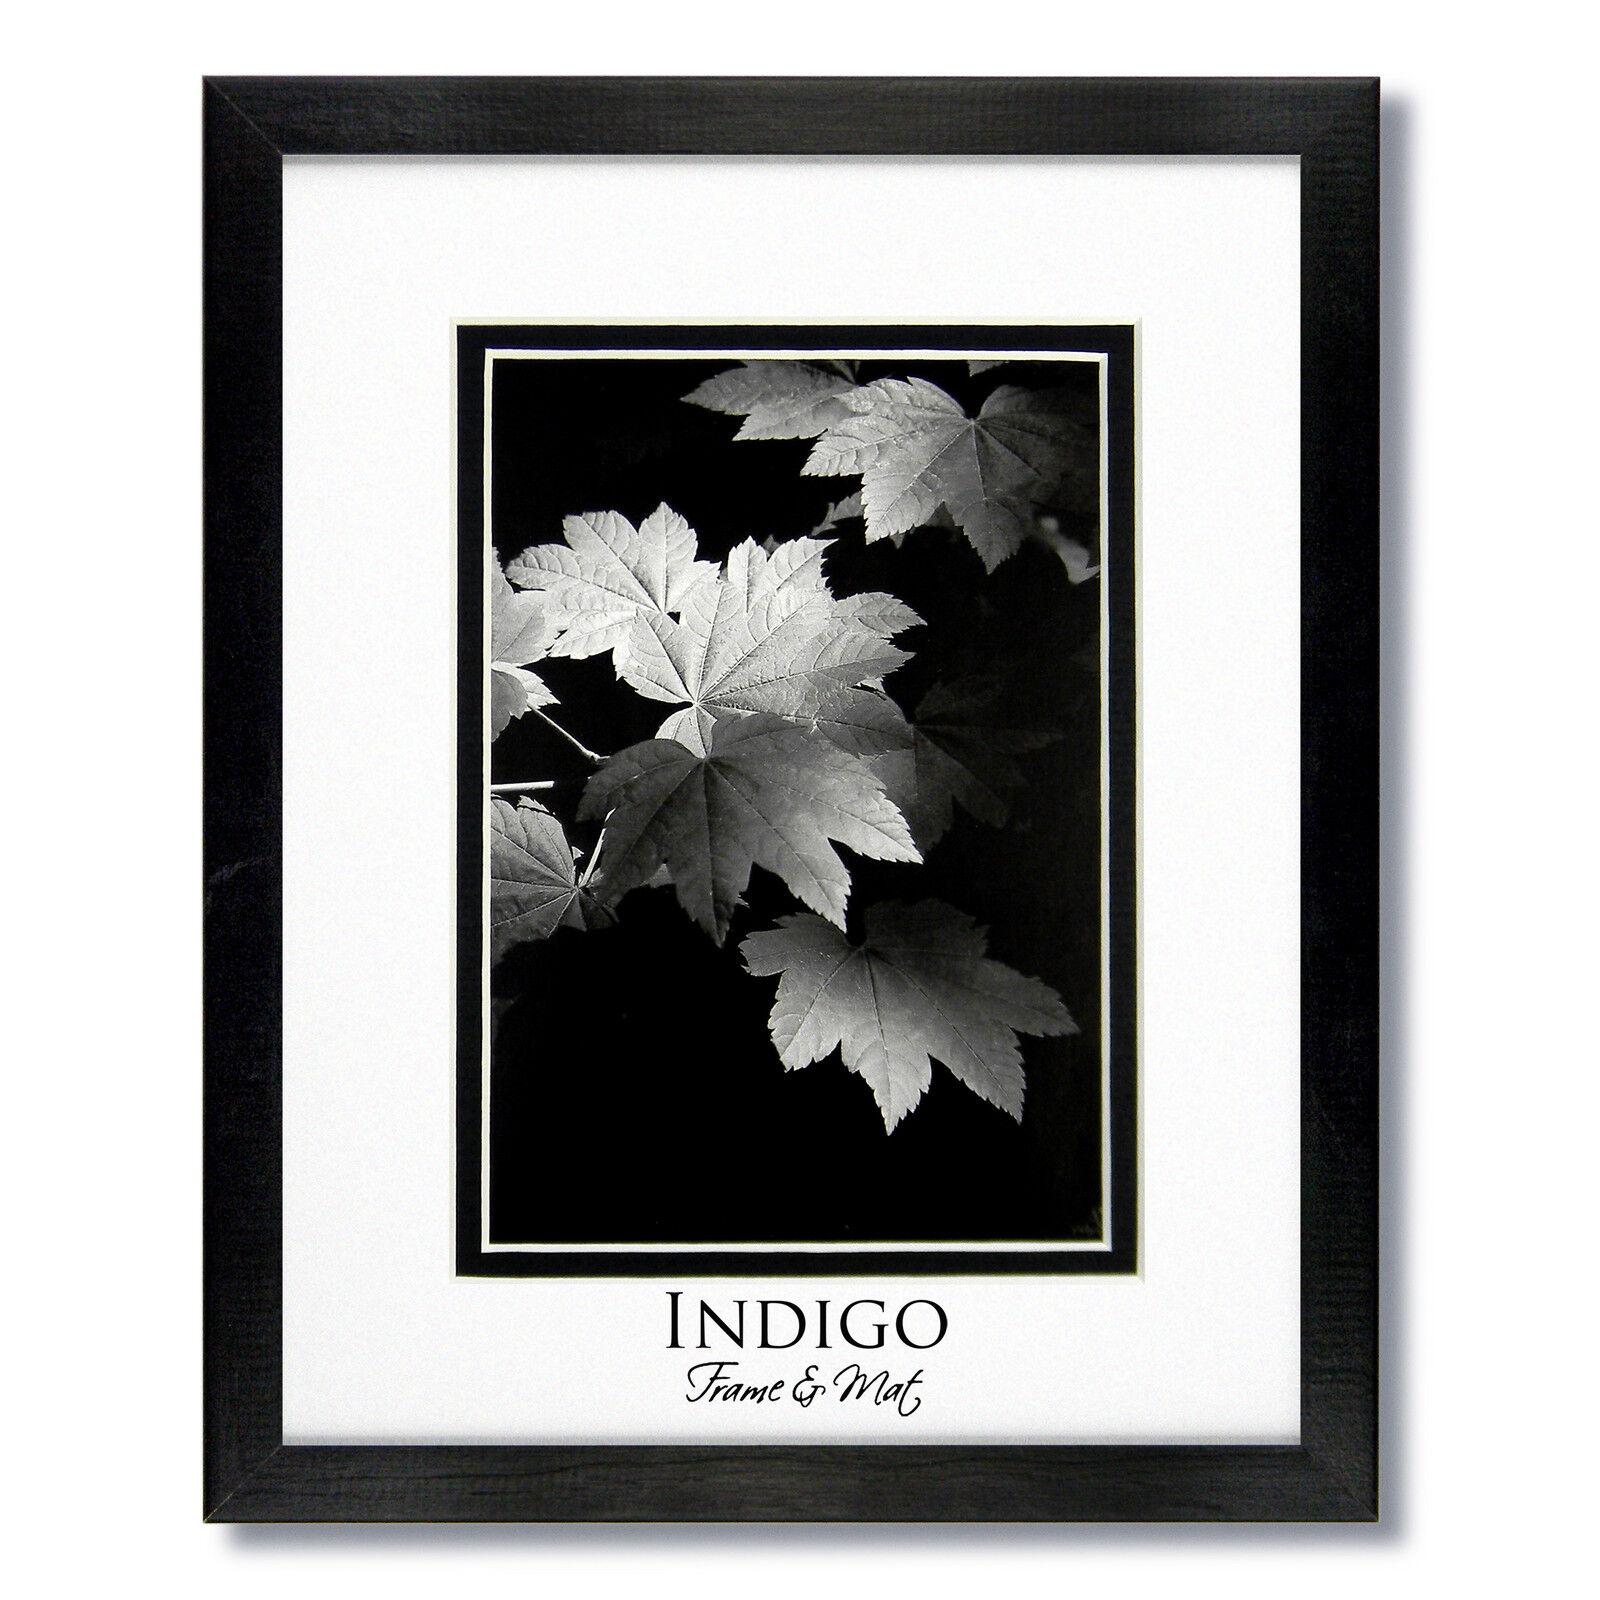 Set of 2 - 11x14 Black Wood Frames Clear Glass White/black Mats for ...